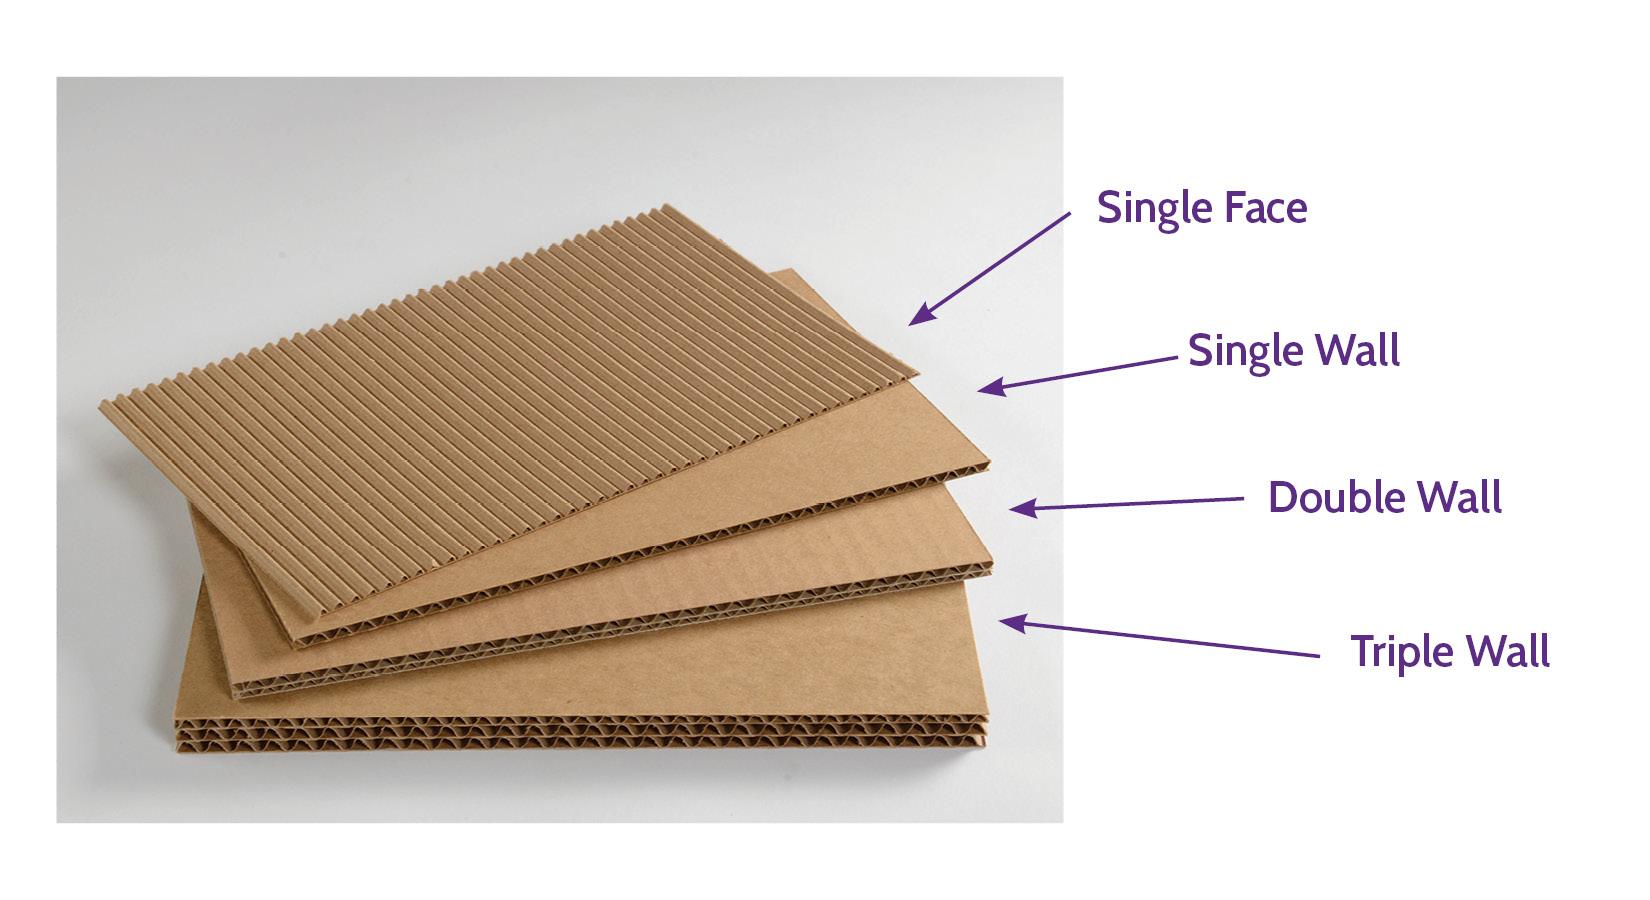 Corrugated Cardboard Characteristics